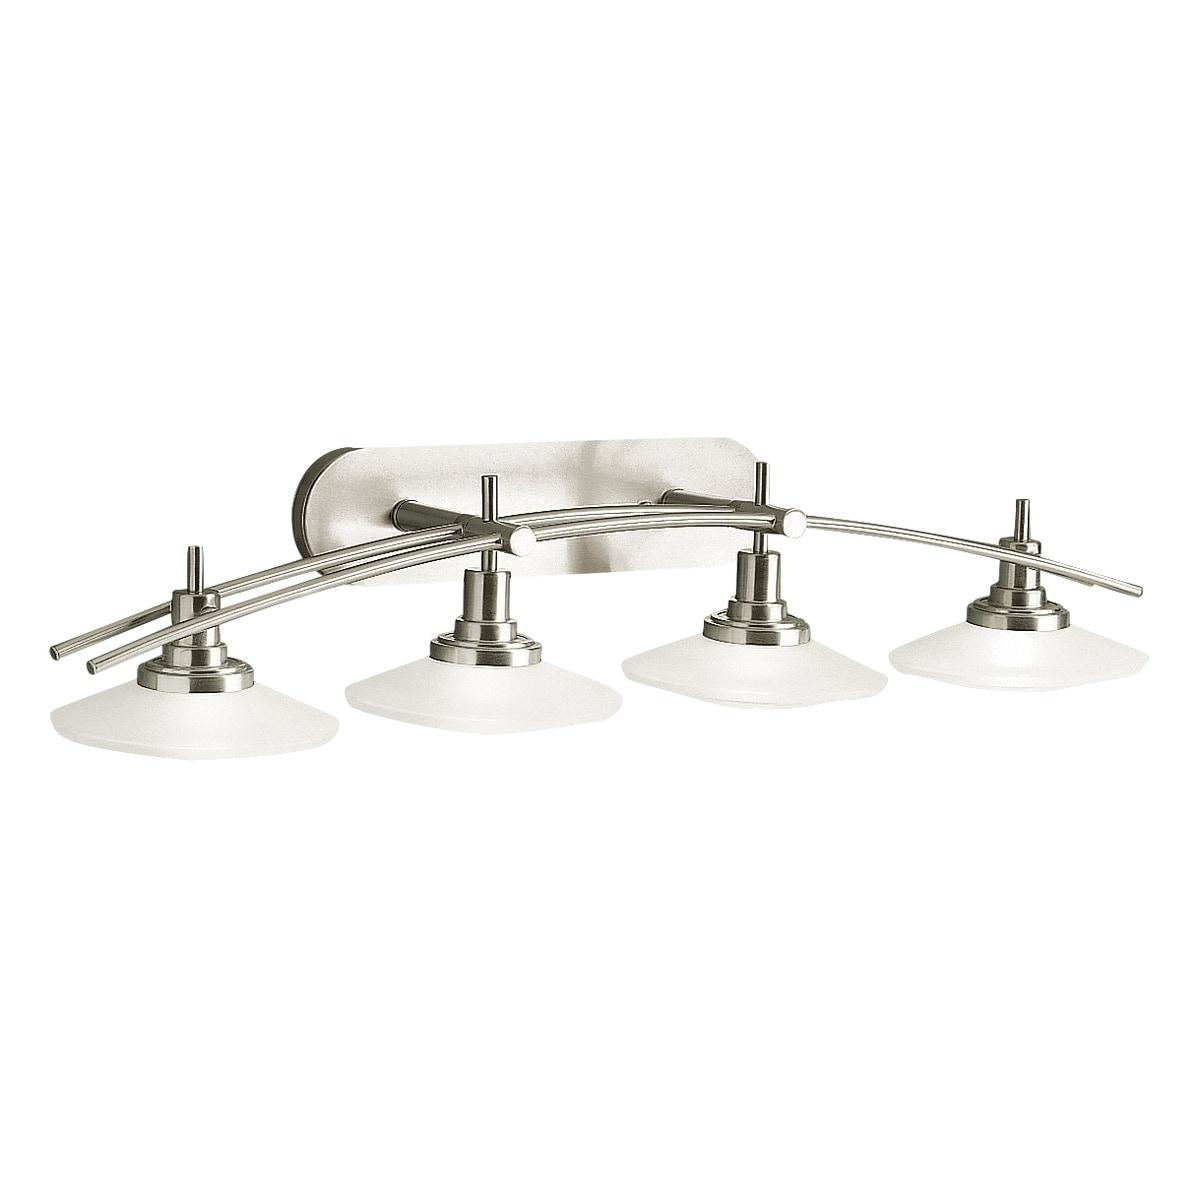 Kichler Lighting Structures Collection 4 Light Brushed Nickel Bath Vanity Light Overstock 12183847